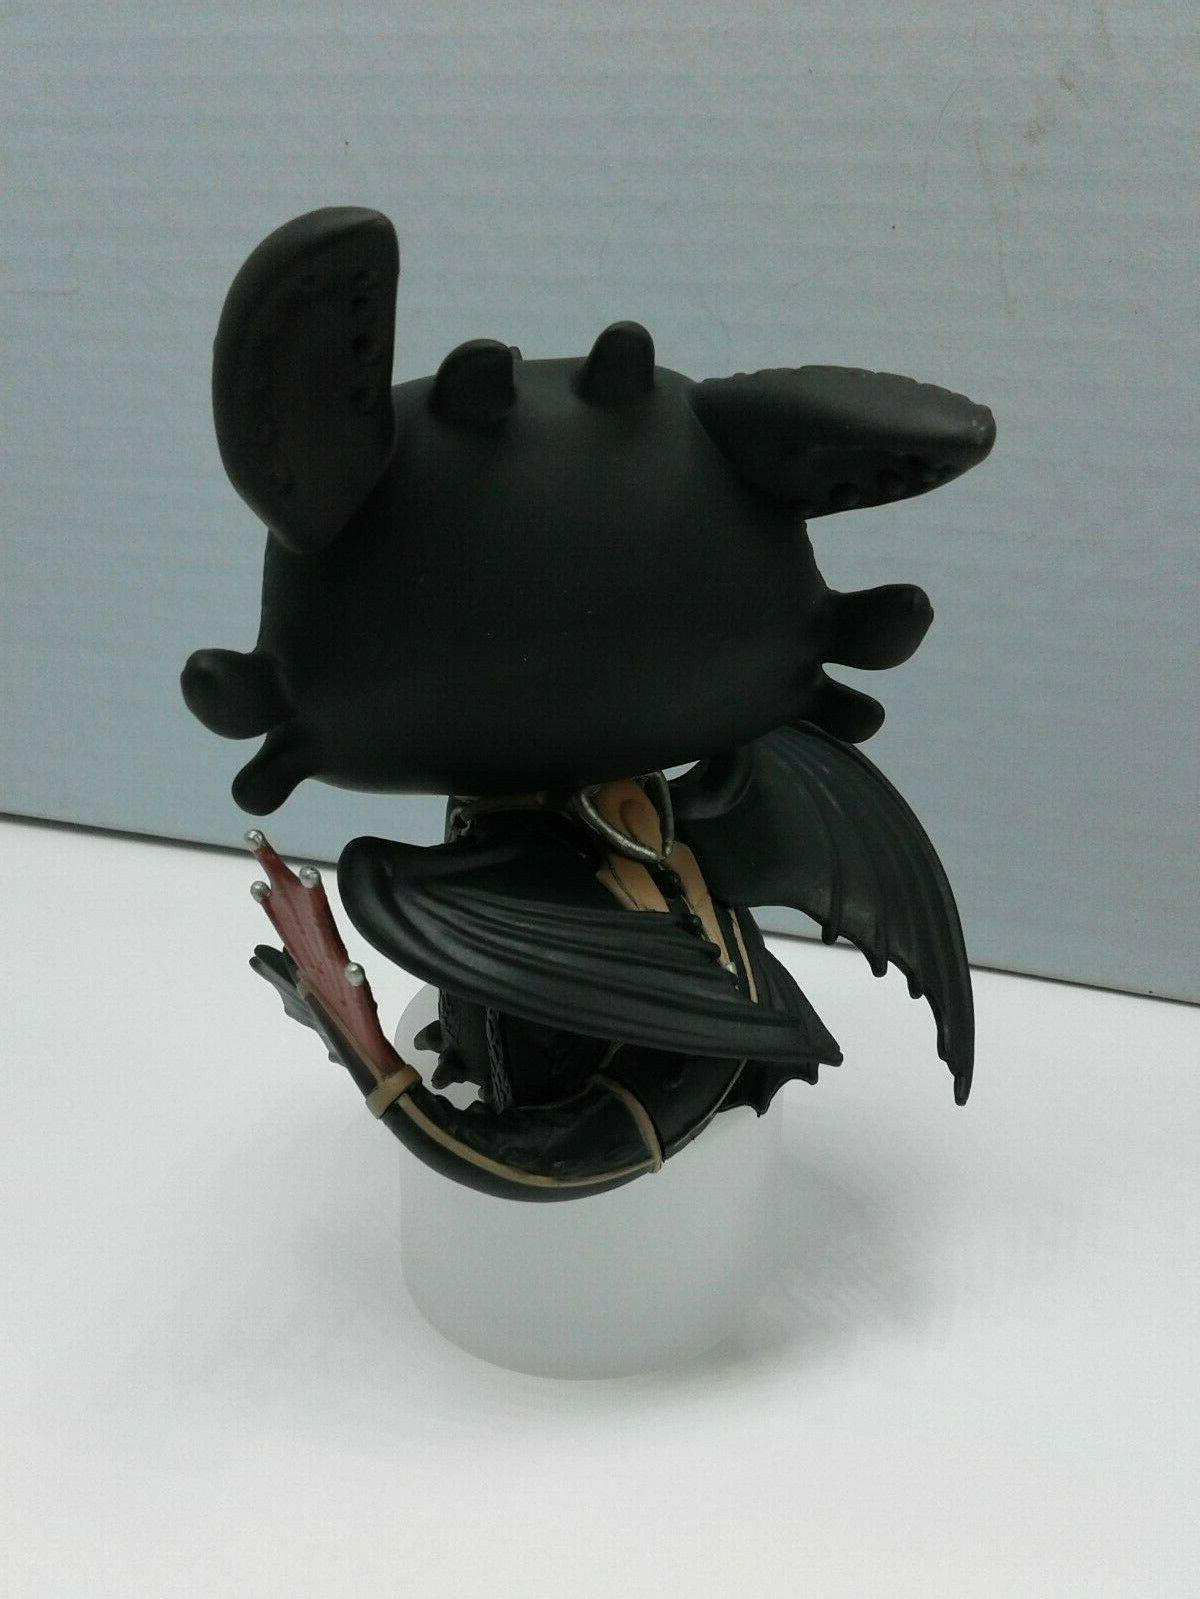 Funko Pop Train Dragon Toothless figure #686